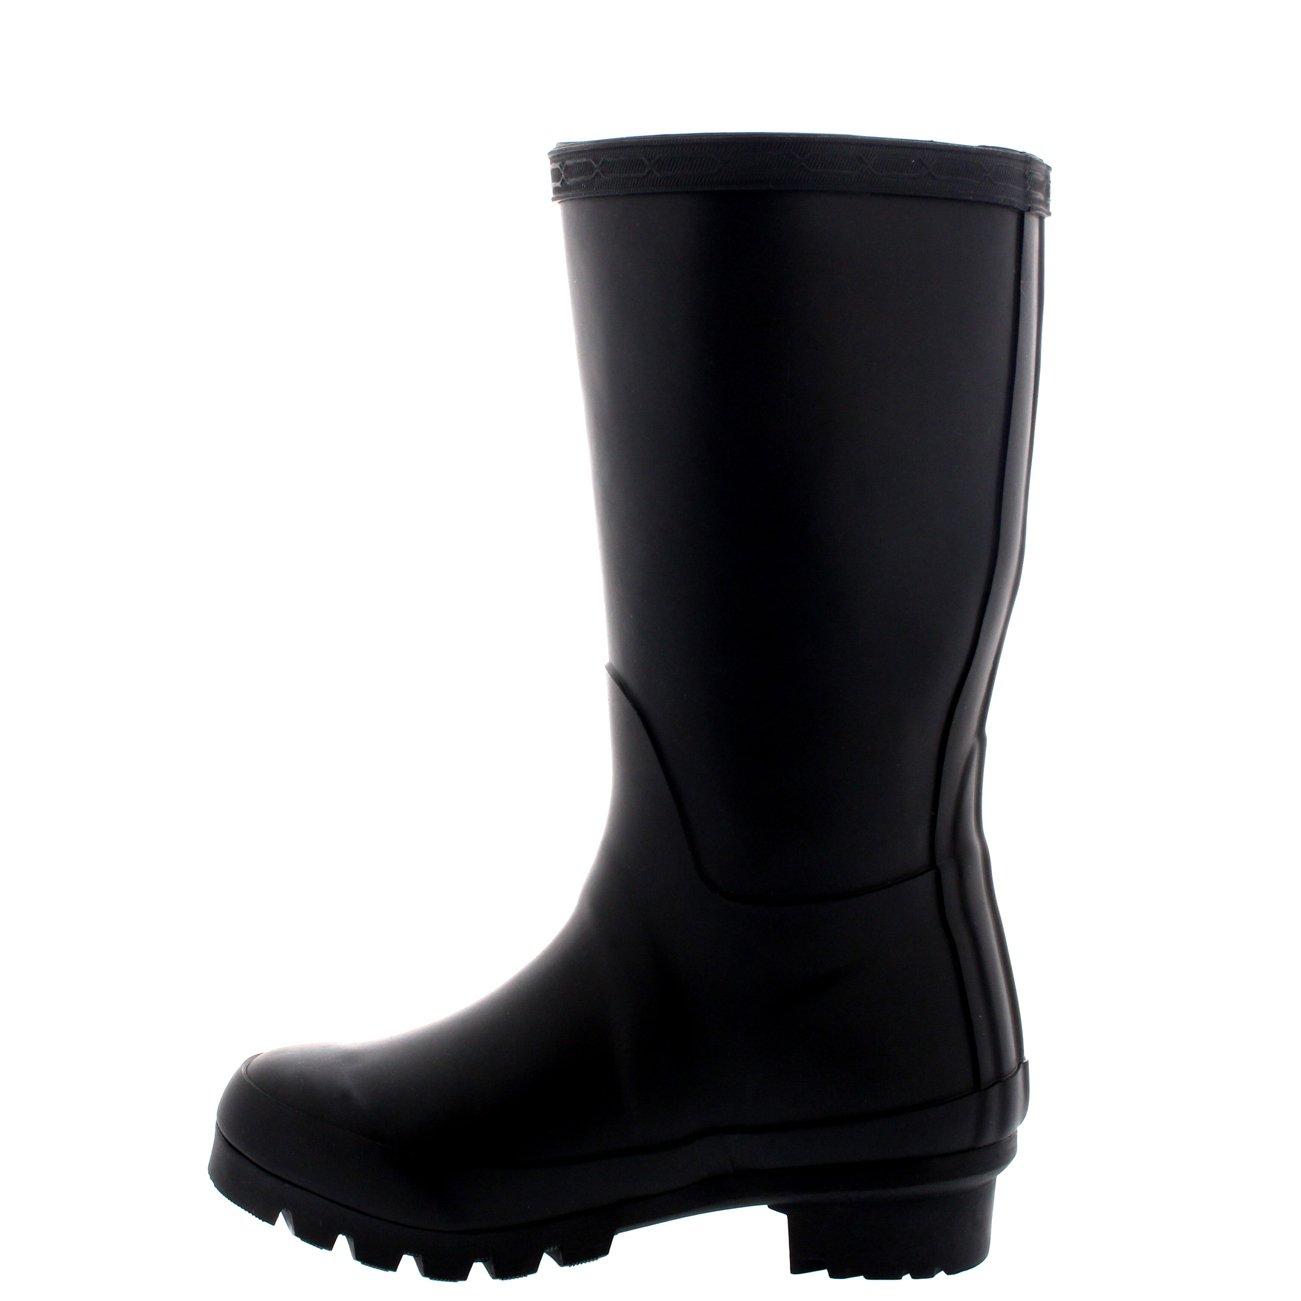 Unisex Kids Original Plain Wellie Rain Snow Winter Waterproof Mud Boots - 4 - BLA36 BL0189 by POLAR (Image #2)